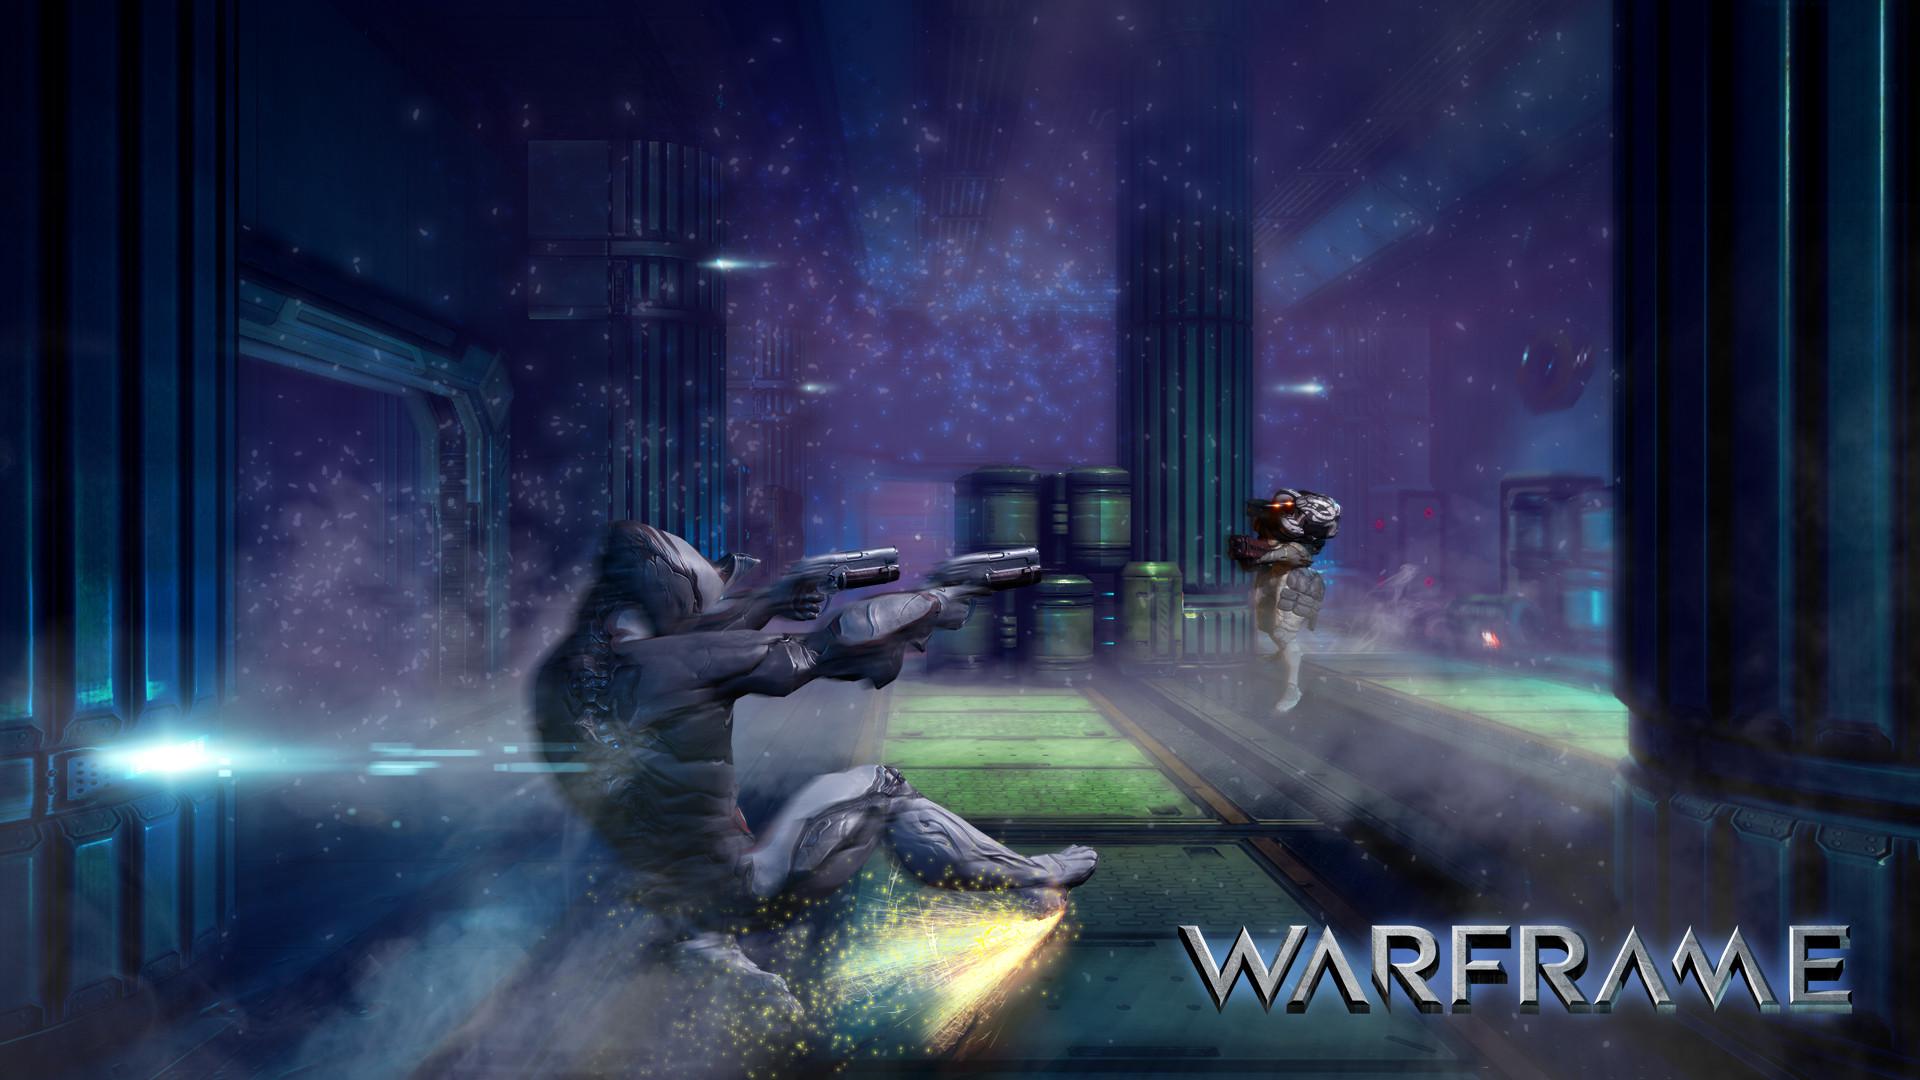 Excalibur-Warframe-Screenshot-x-wallpaper-wp5206265